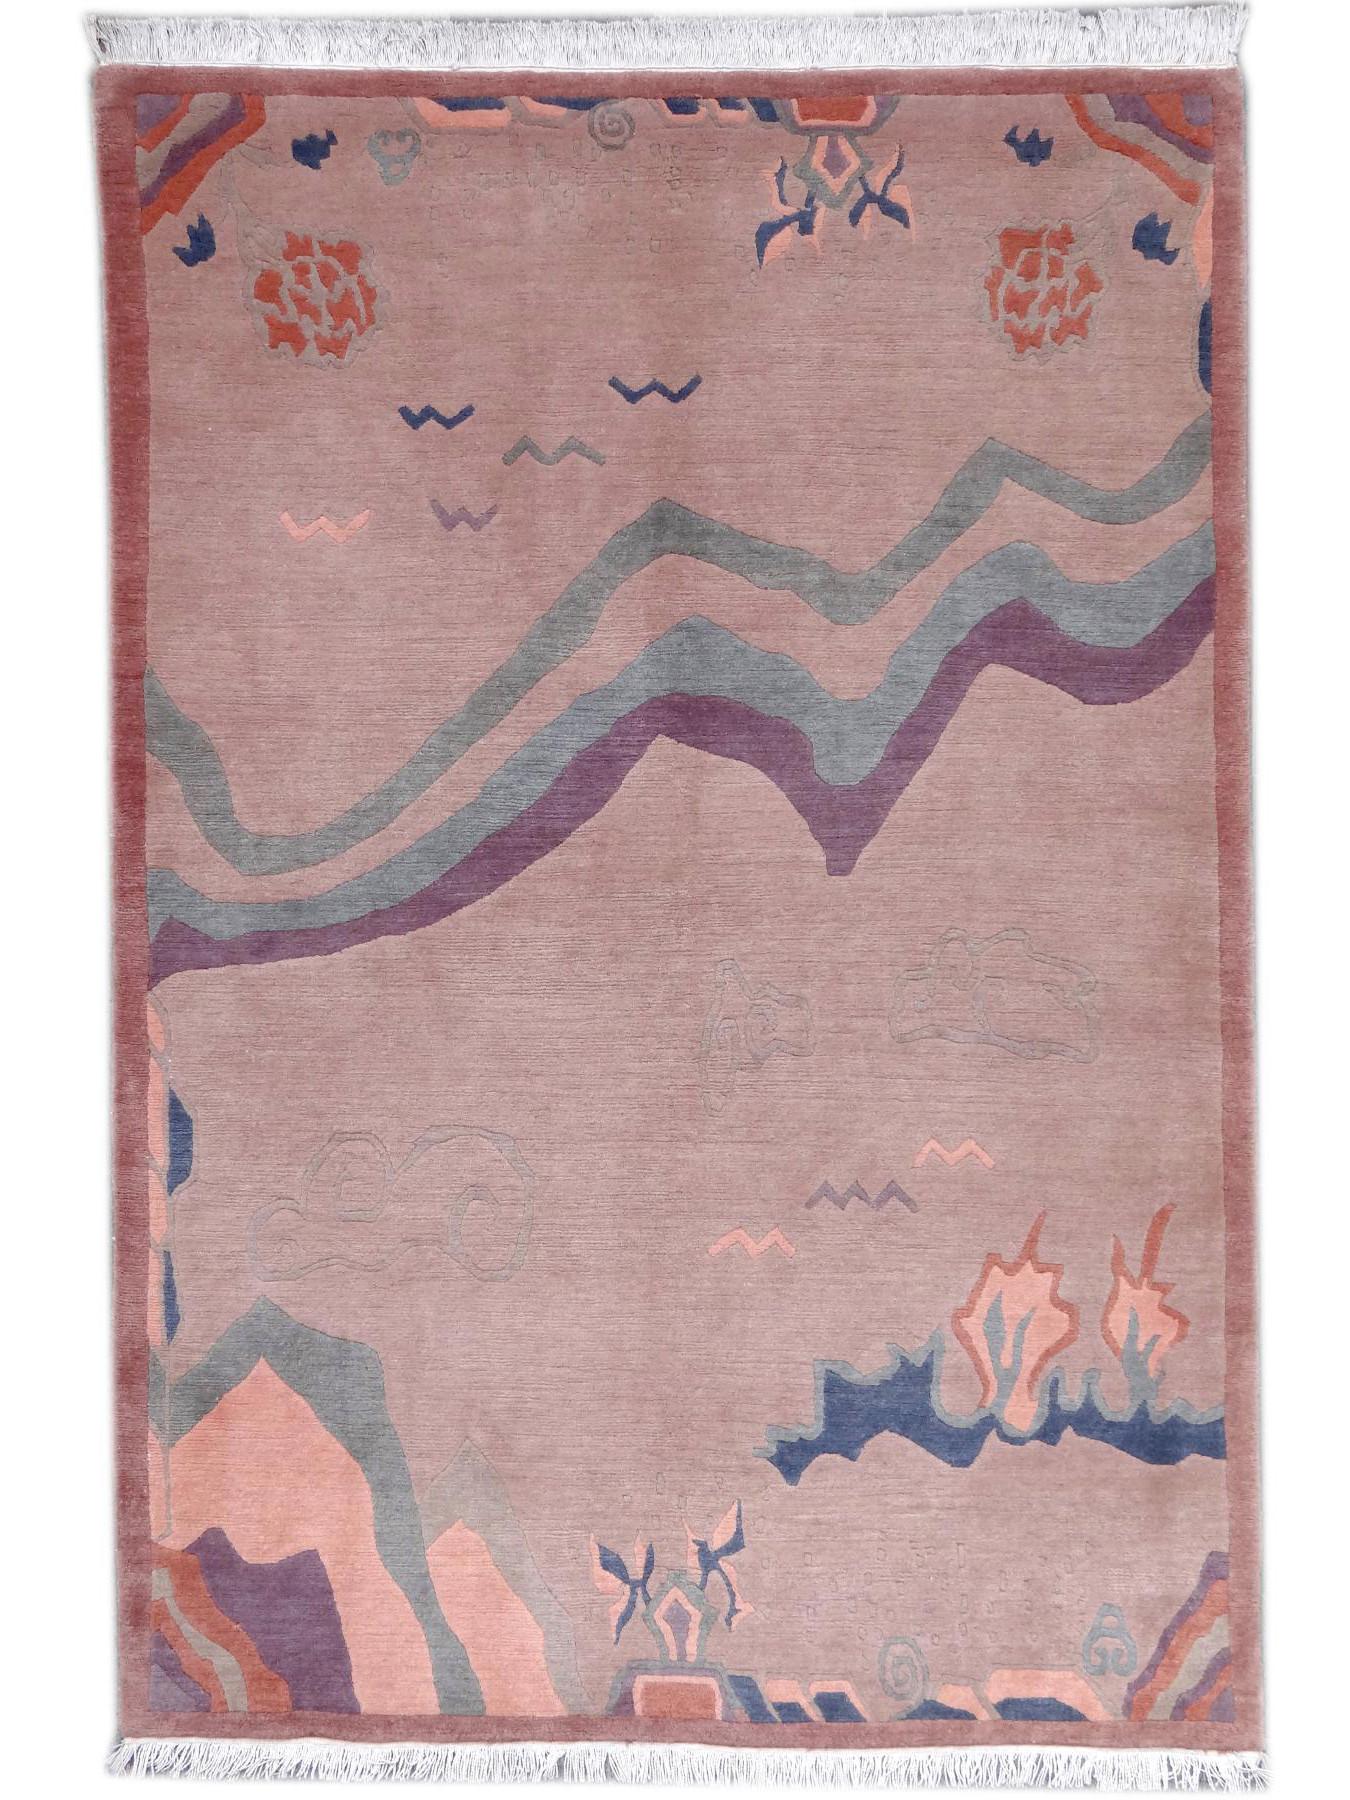 Classic rugs - HIMALAYAN KINGDOMS VT43 - 5988